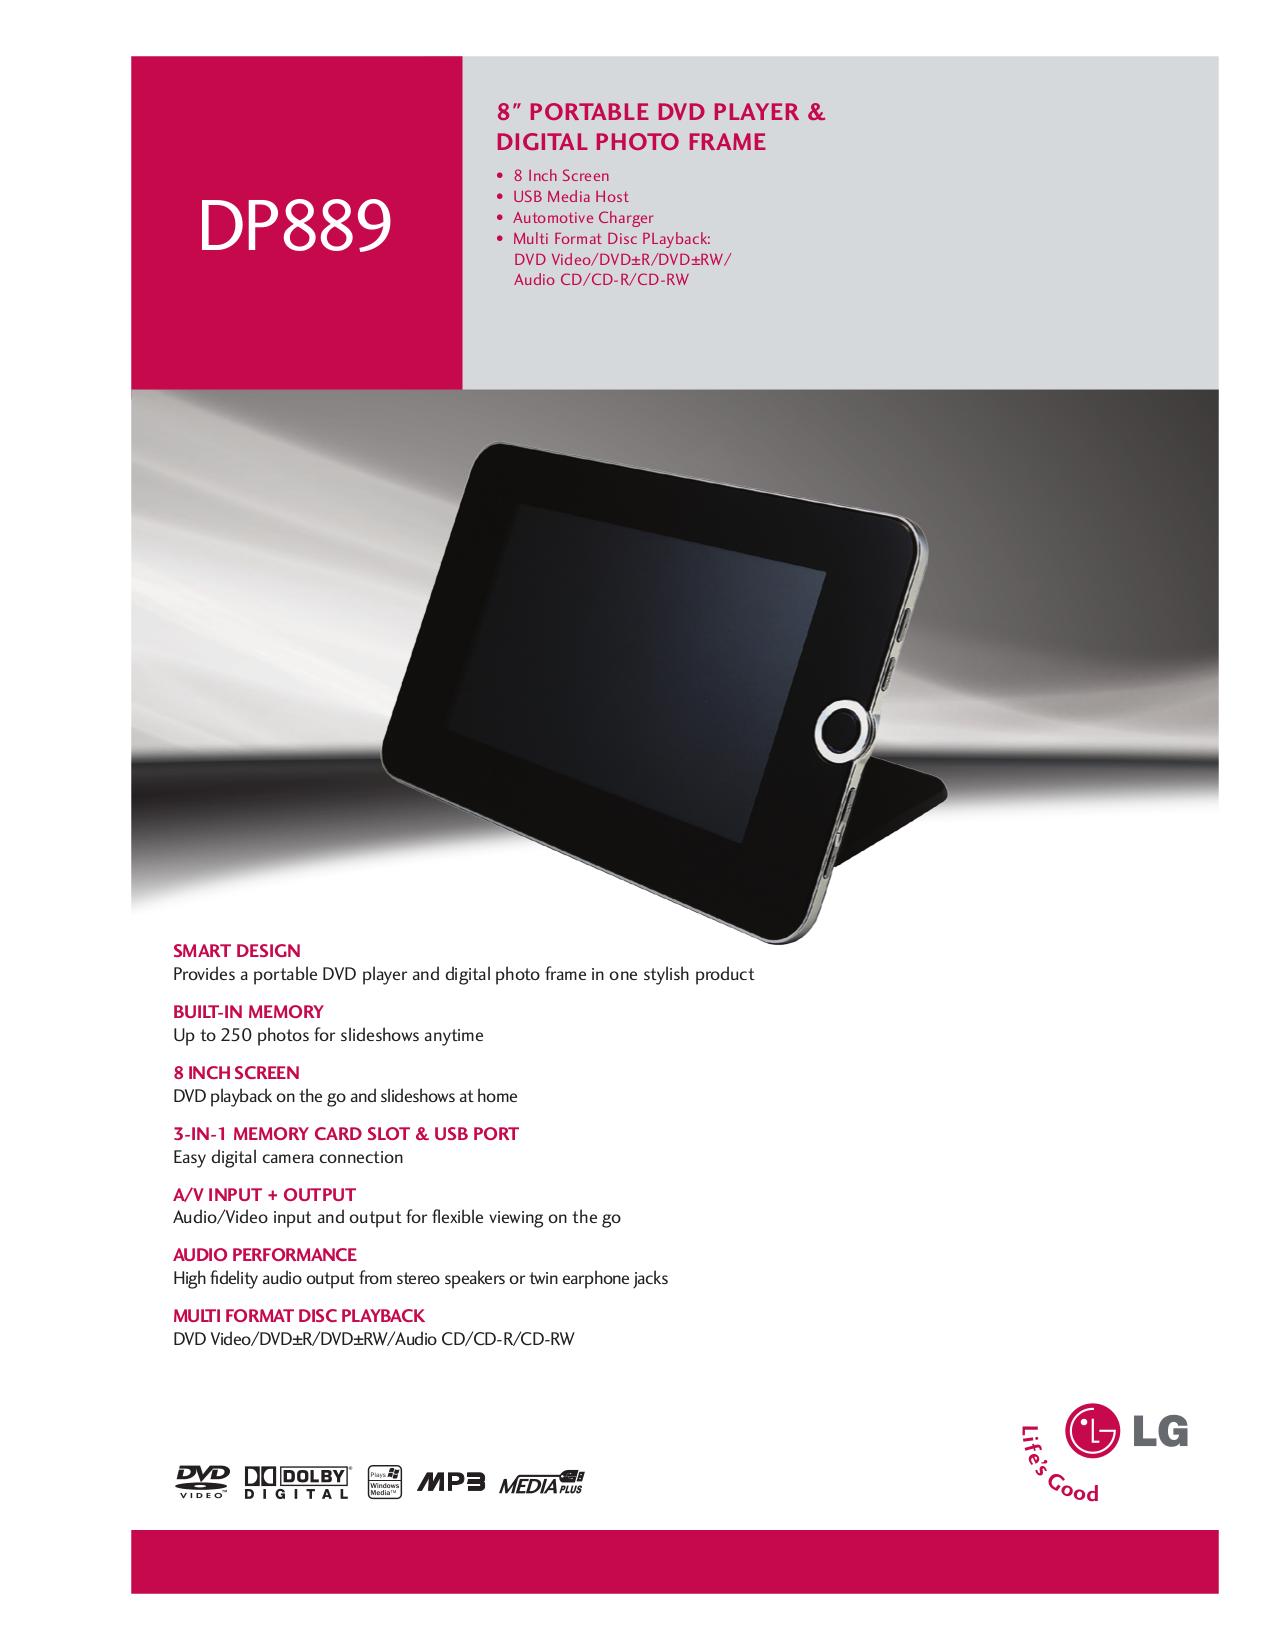 pdf for LG Portable DVD Player DP889 manual